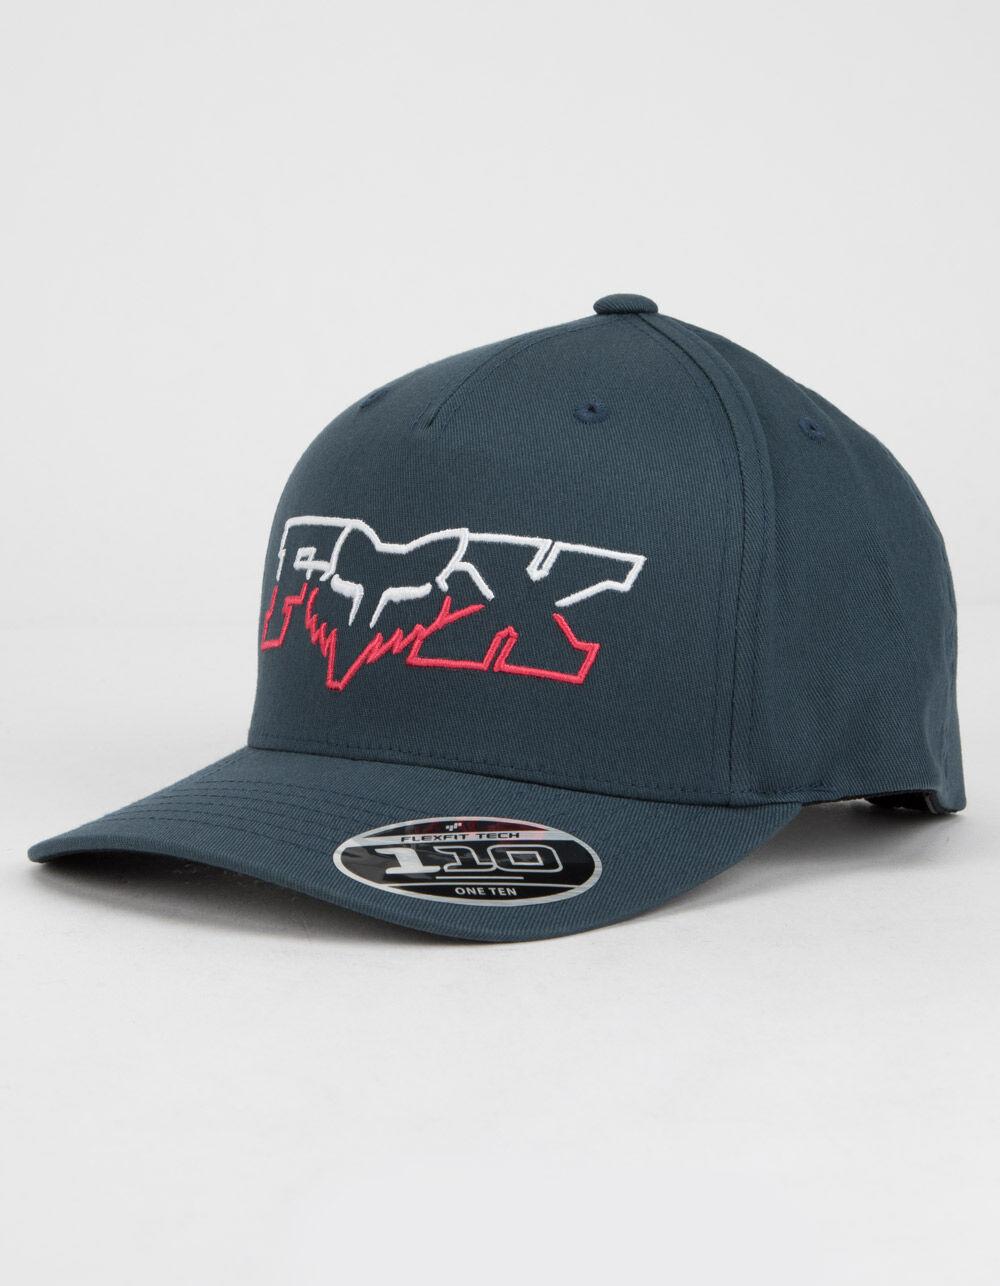 FOX Duel Head 110 Snapback Hat